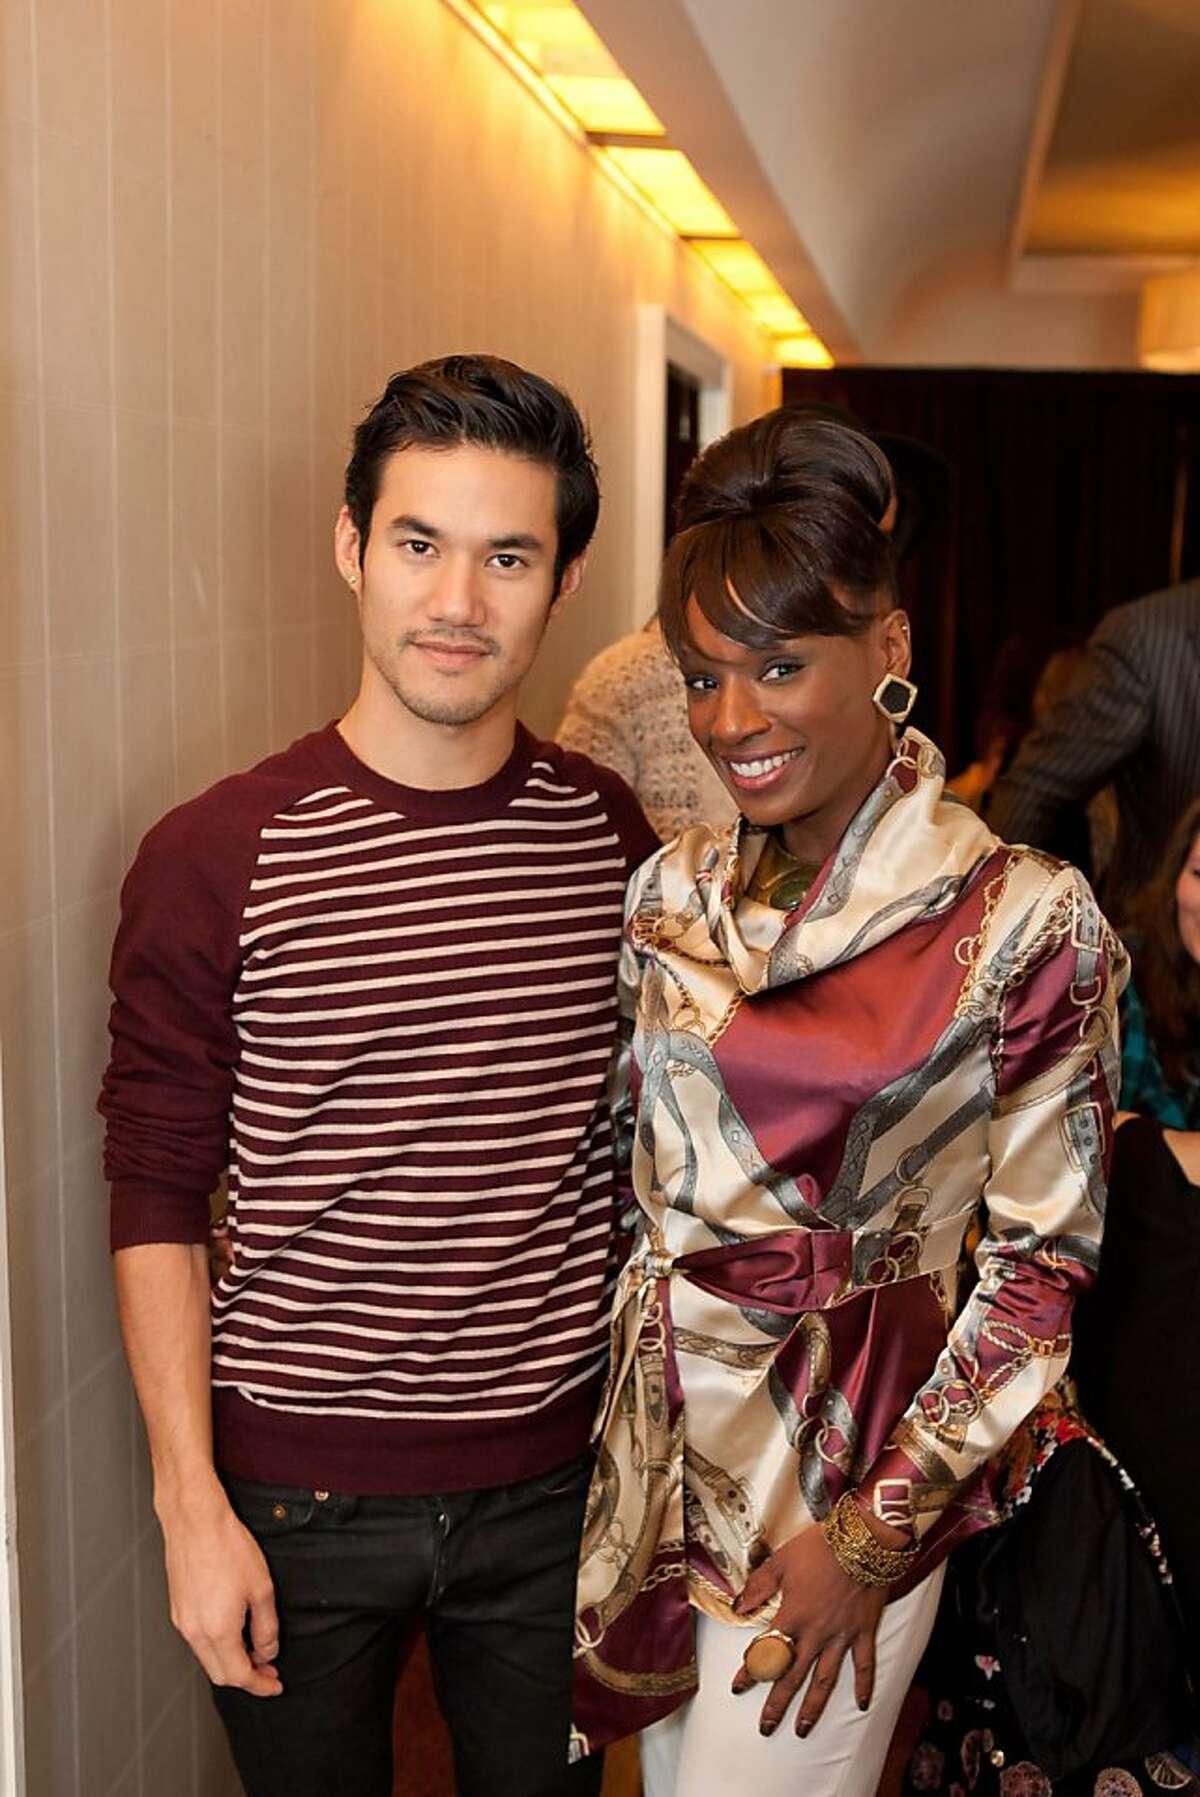 Designer Joseph Altuzarra with Pernella Sommerville at the event at Neiman Marcus